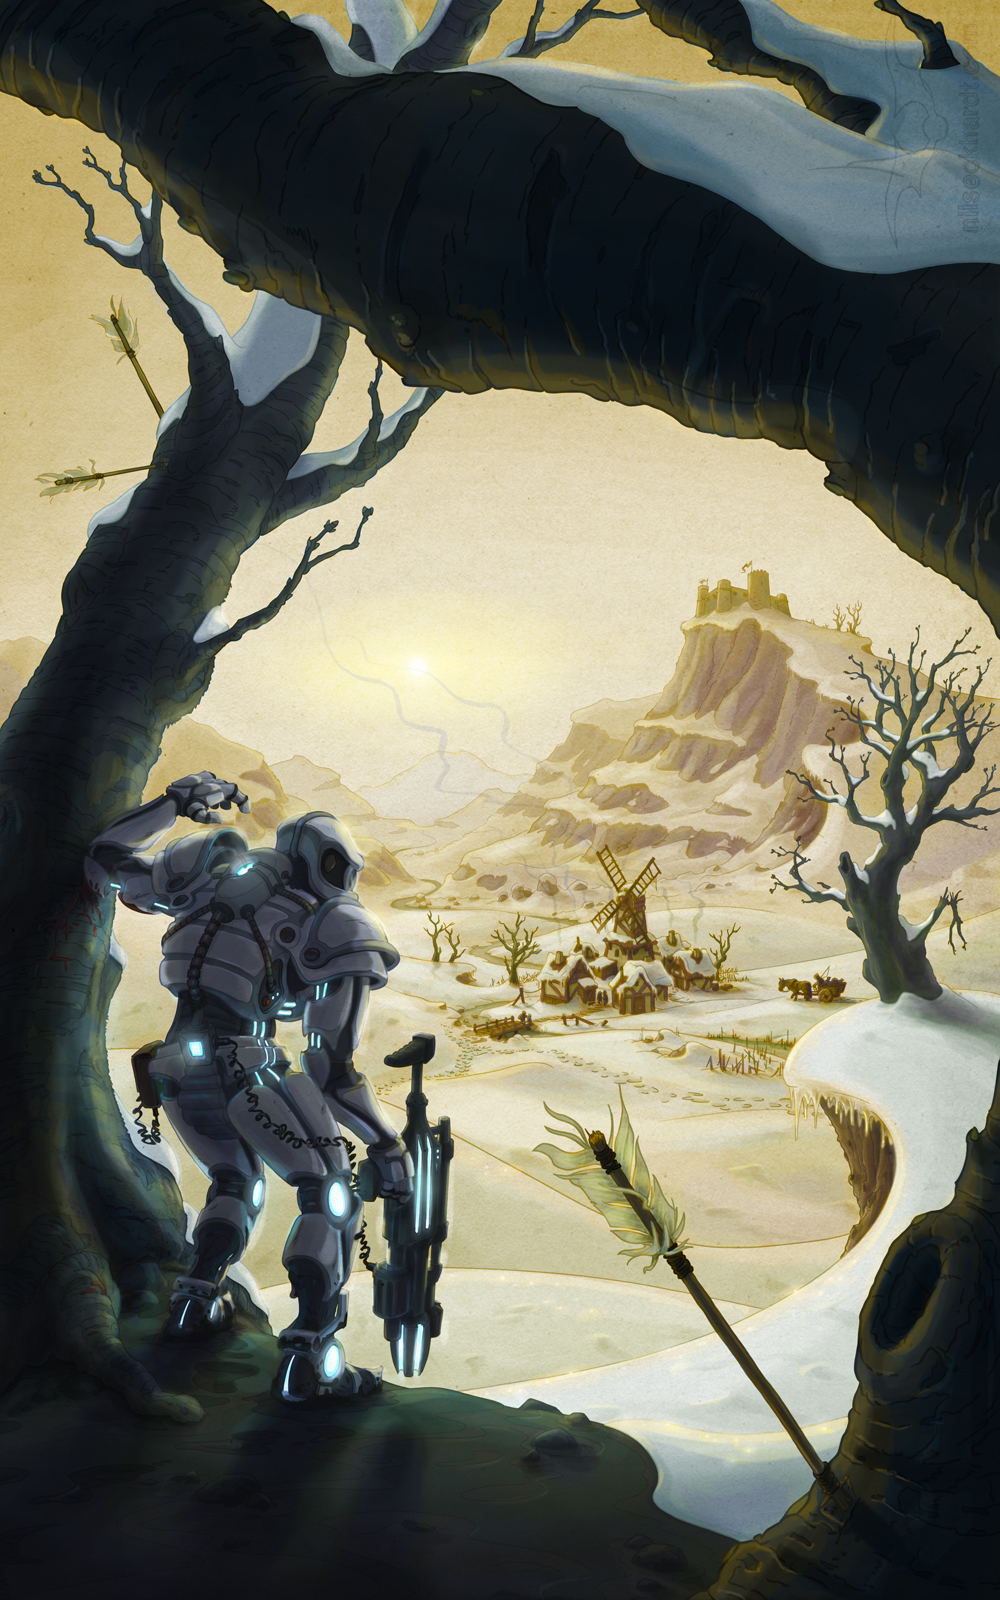 Cover Illustration for a sci-fi fantasy crossover novel